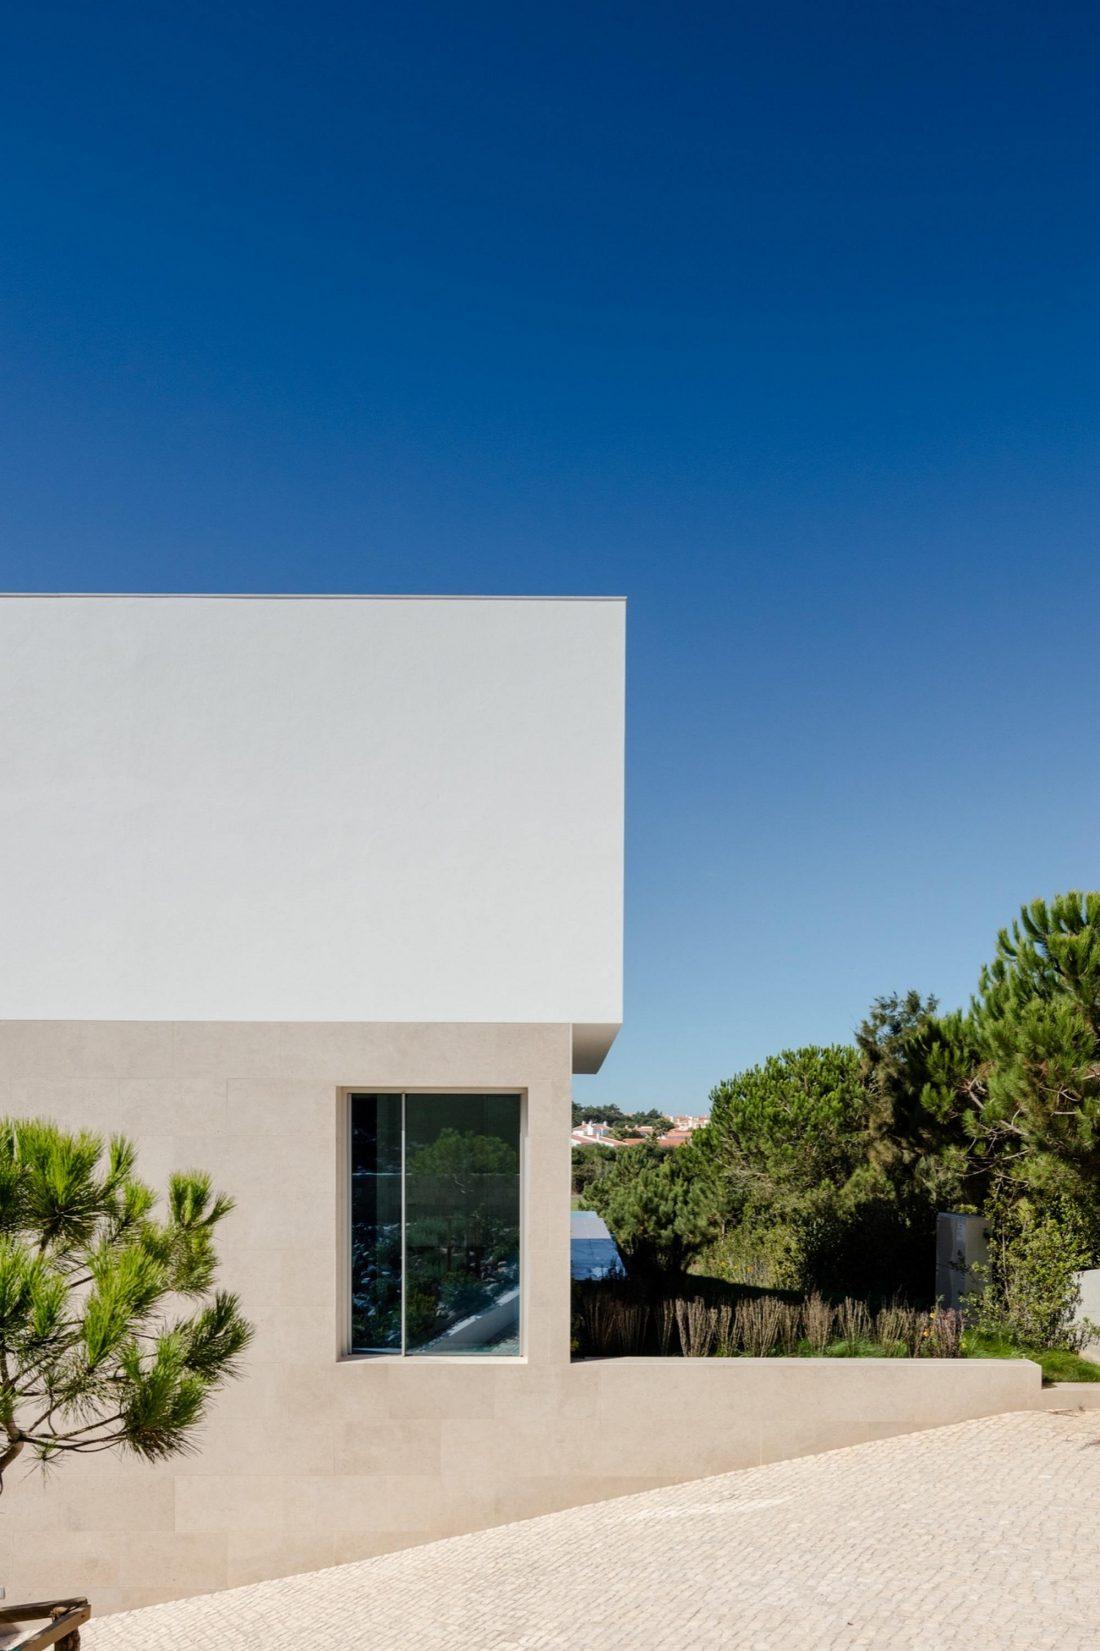 Дом в Обидуше, Португалия, от студии RSM arquitecto и Russell Jones Architects 21